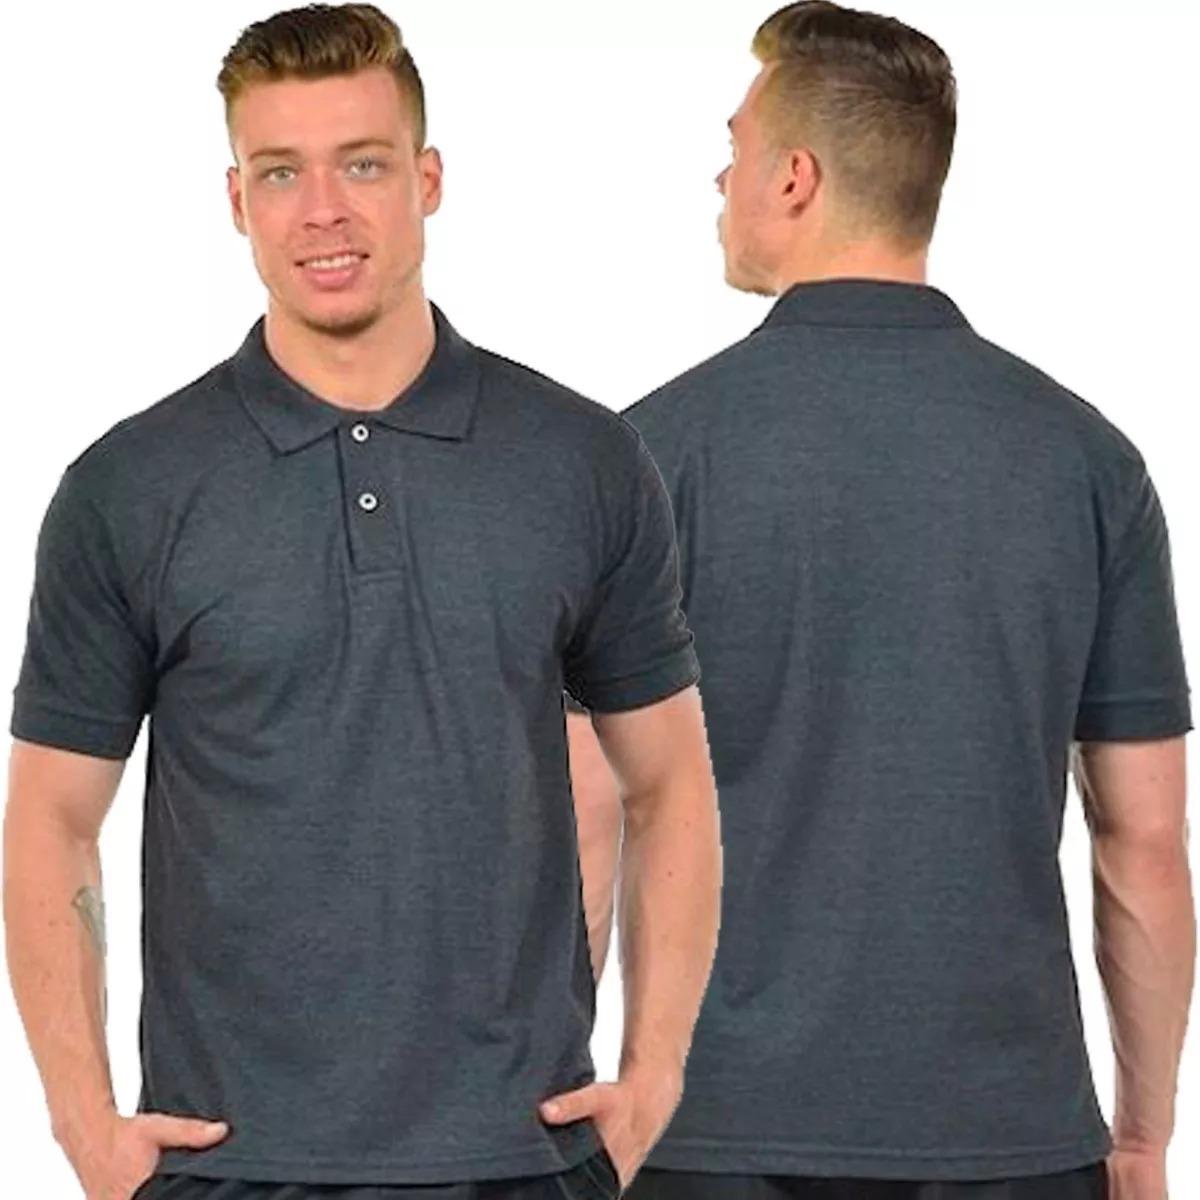 2dee154631 Kit 5 Camisas Polo Masculina Camiseta Gola Atacado Uniforme - R  143 ...